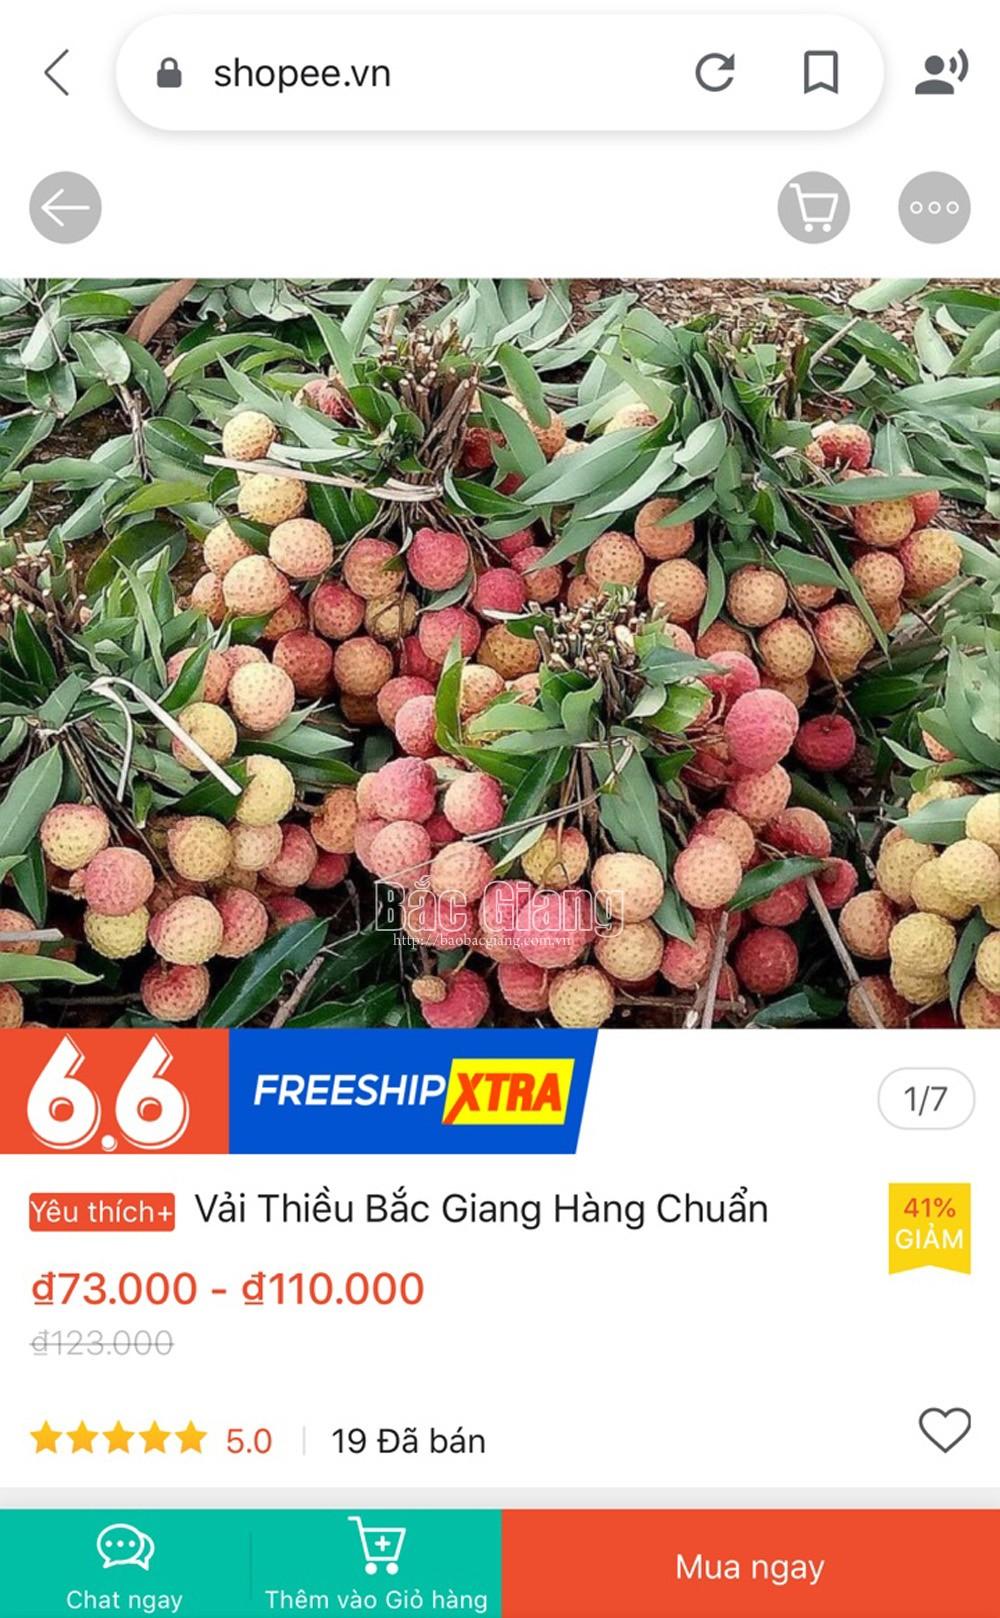 Bac Giang lychee, e-commerce platforms, Digital Economy, special fruits, 4.0 technology era, e-commerce transaction